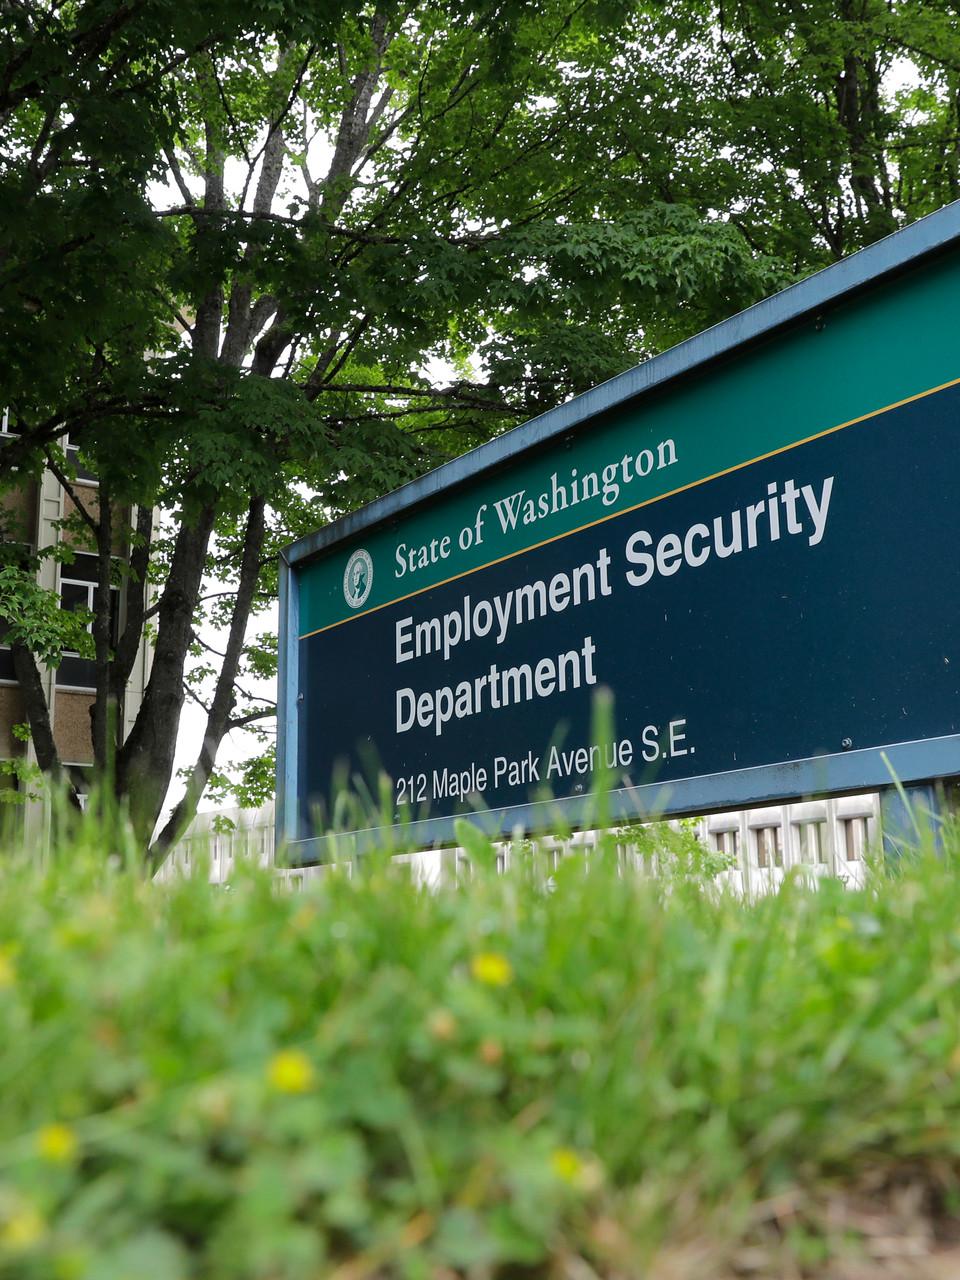 State of Washington Employment Security Department bilked by Onyegbula, Rufai